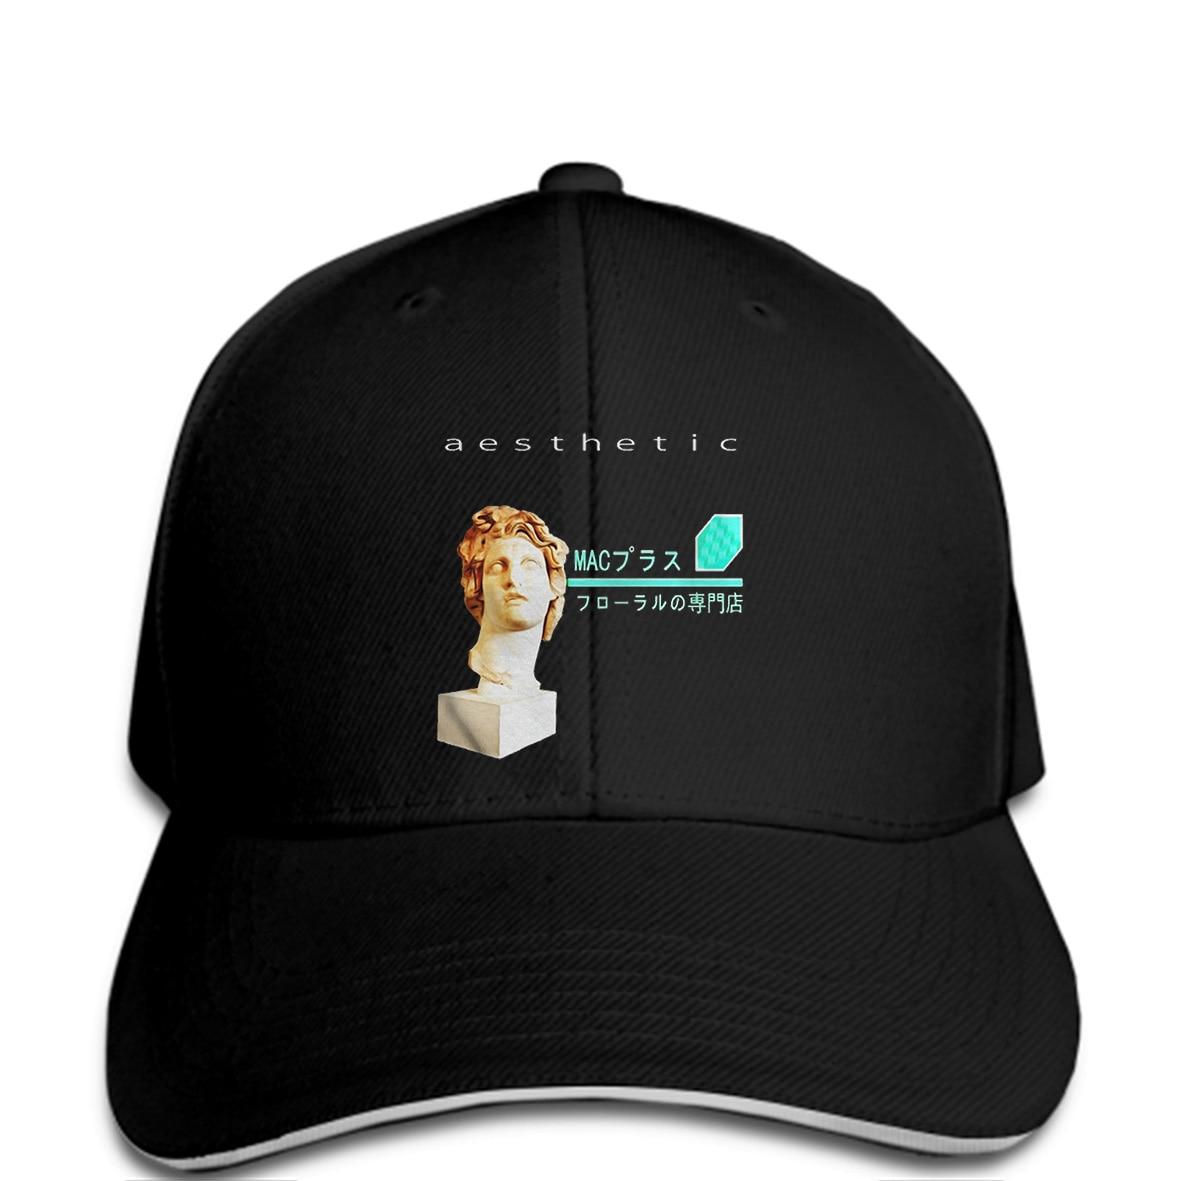 Dedicated Baseball Cap 2018 Fashion Men Hat Vaporwave Aesthetic Hat Meme Men's Baseball Caps